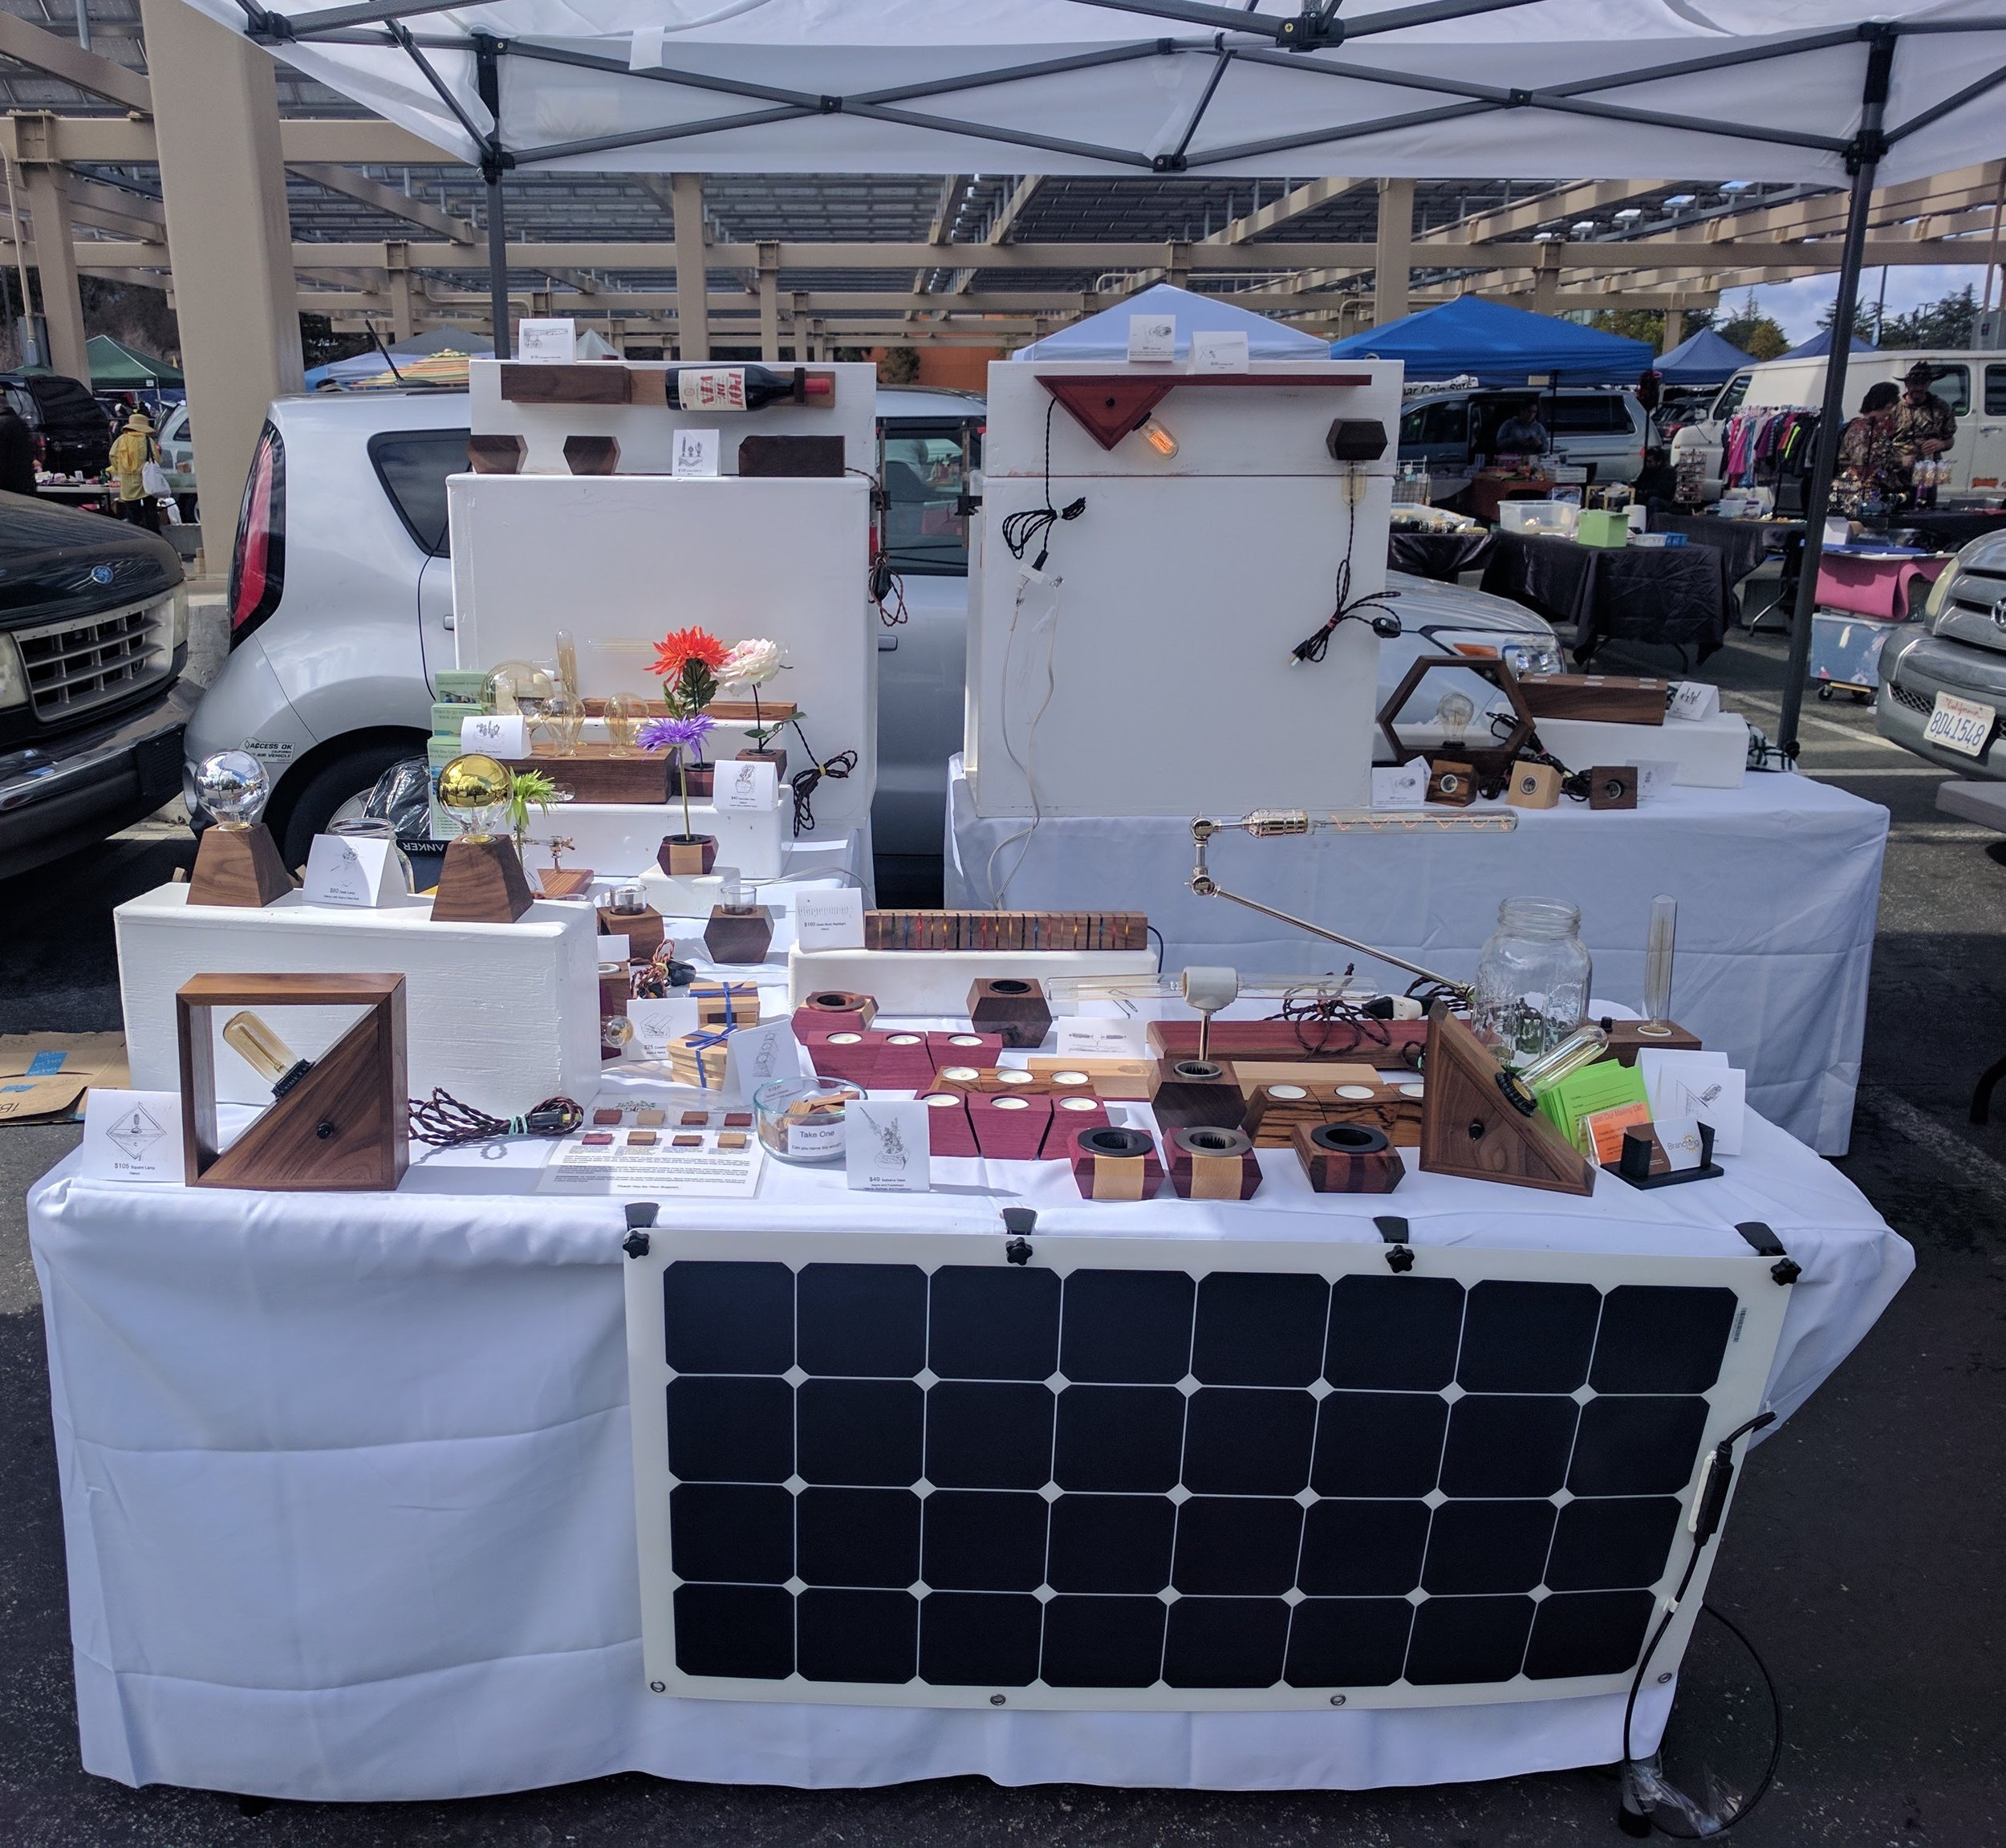 March 4 DeAnza Flea Market